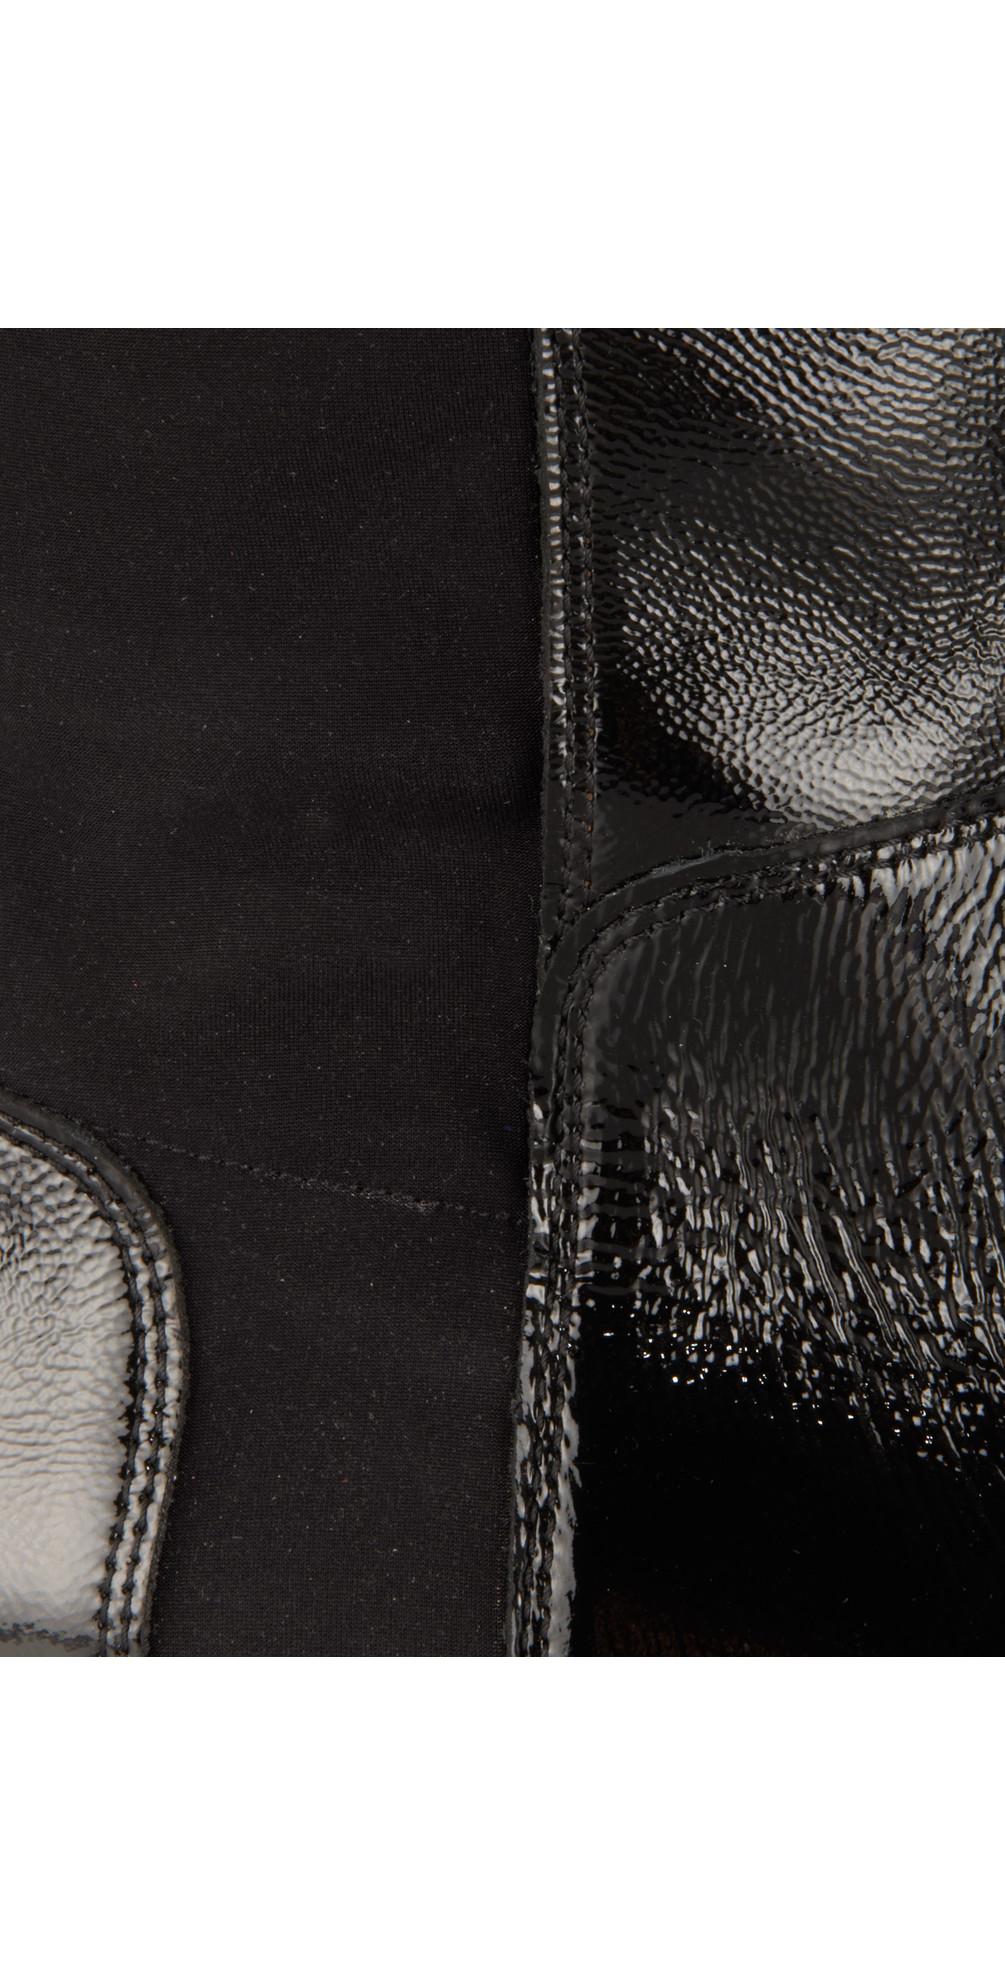 kennel und schmenger long flat patent boot in schwarz. Black Bedroom Furniture Sets. Home Design Ideas